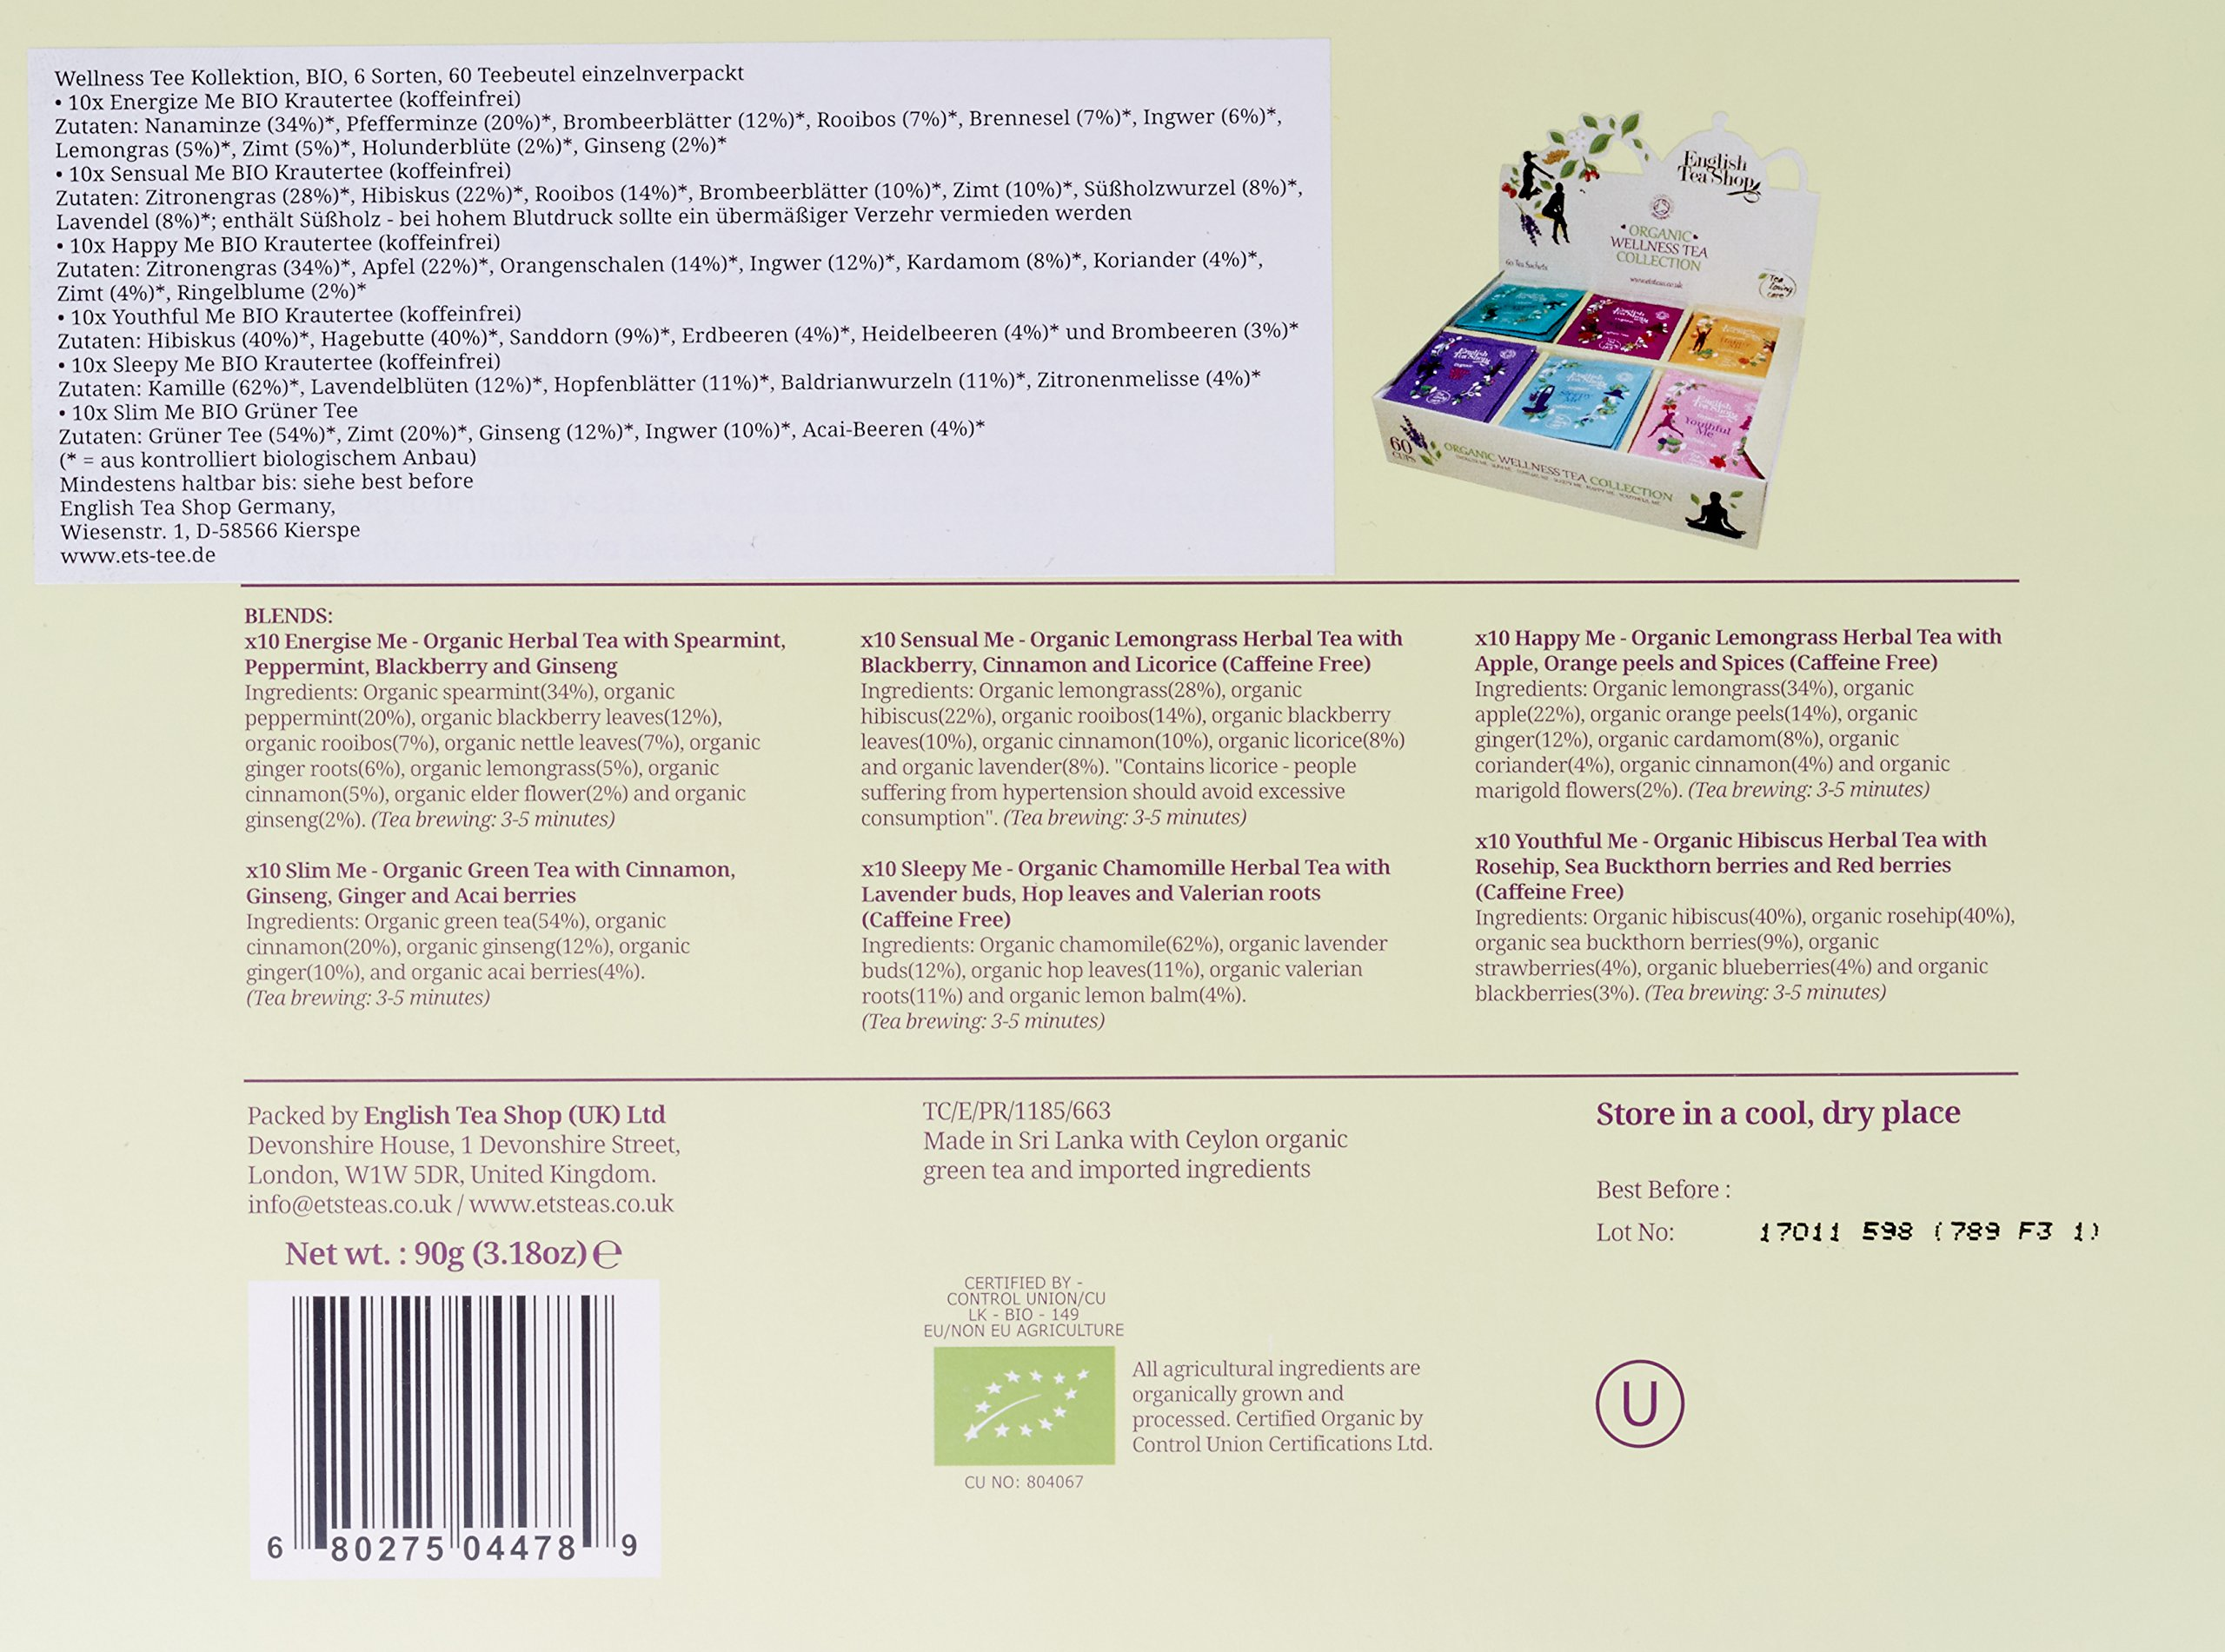 English-Tea-Shop-Wellness-Tee-Kollektion-BIO-6-Sorten-60-Teebeutel